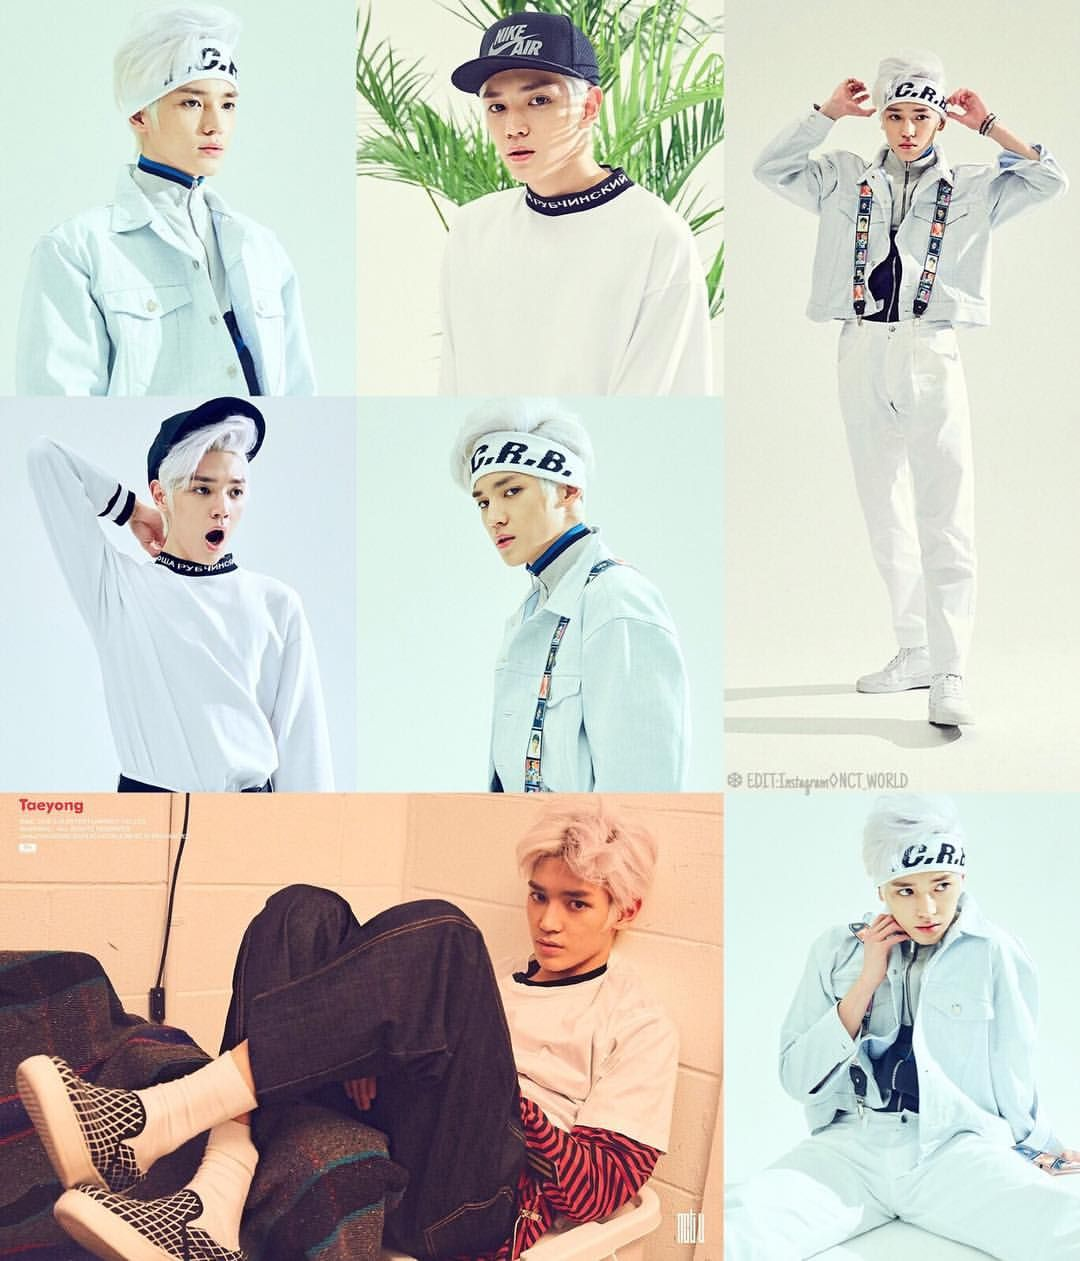 OFFICIAL] NCT U's Taeyong Debut Teaser Image